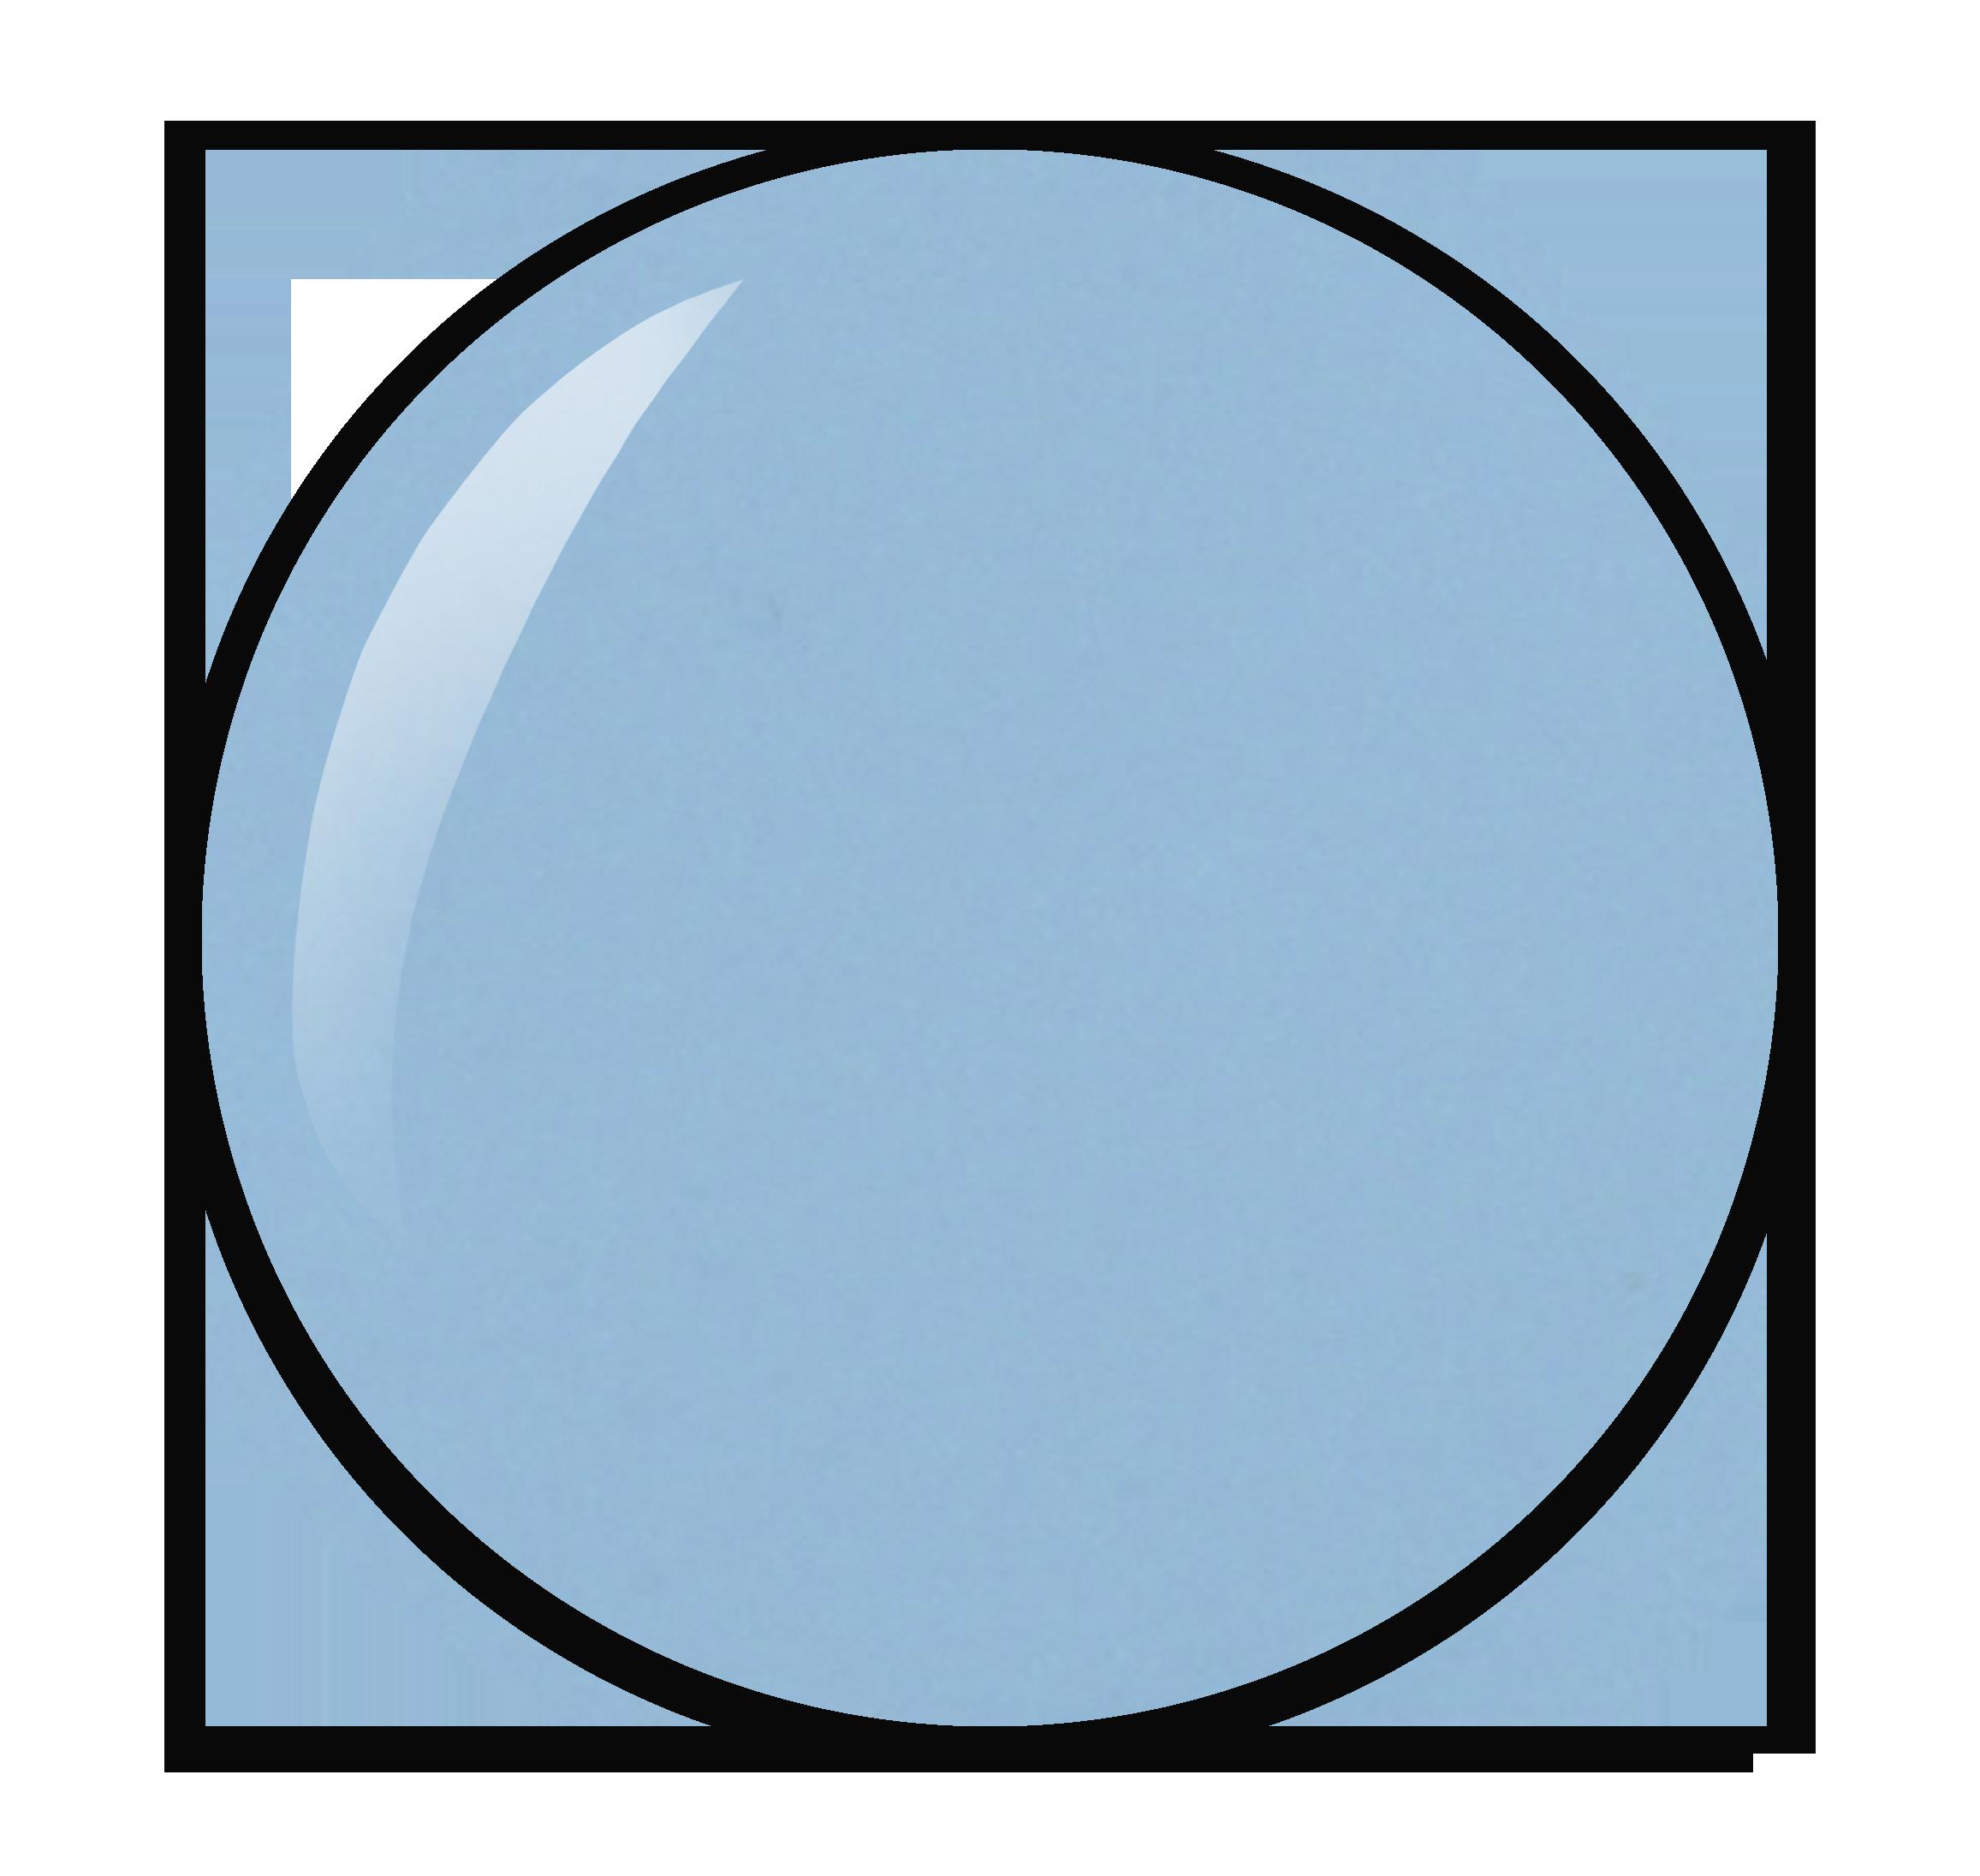 lichtblauwe nagellak kleurnummer 150 uit de Herôme nagellak collectie